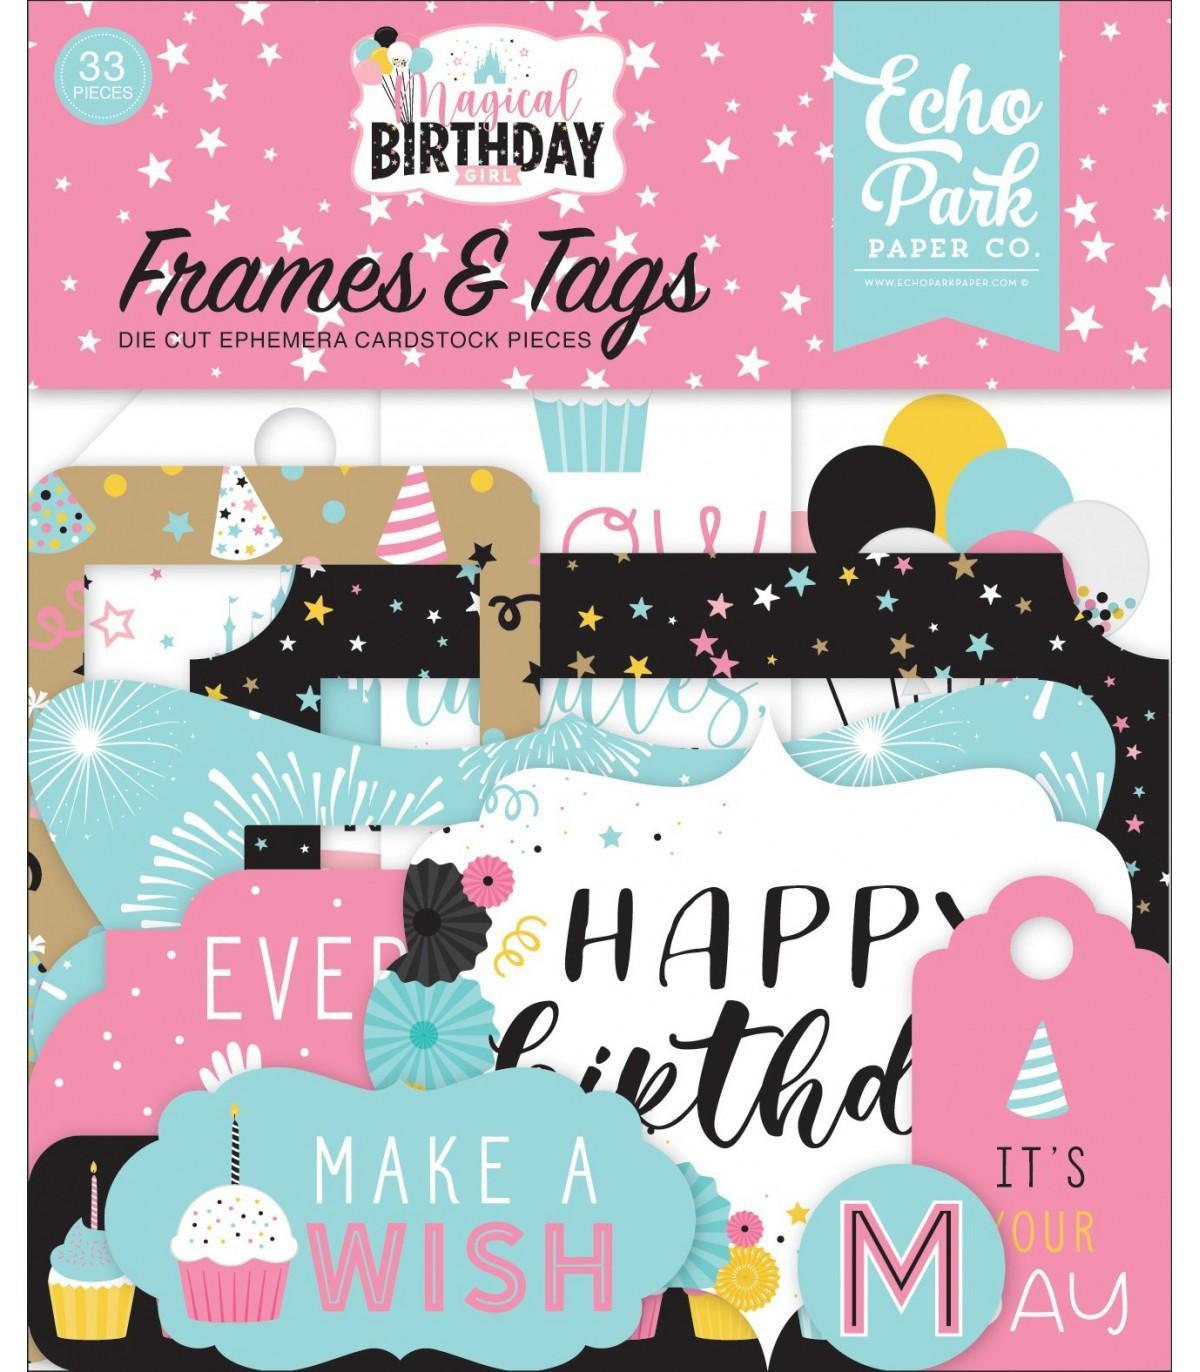 FRAMES & TAGS MAGICAL BIRTHDAY GIRL ECHO PARK